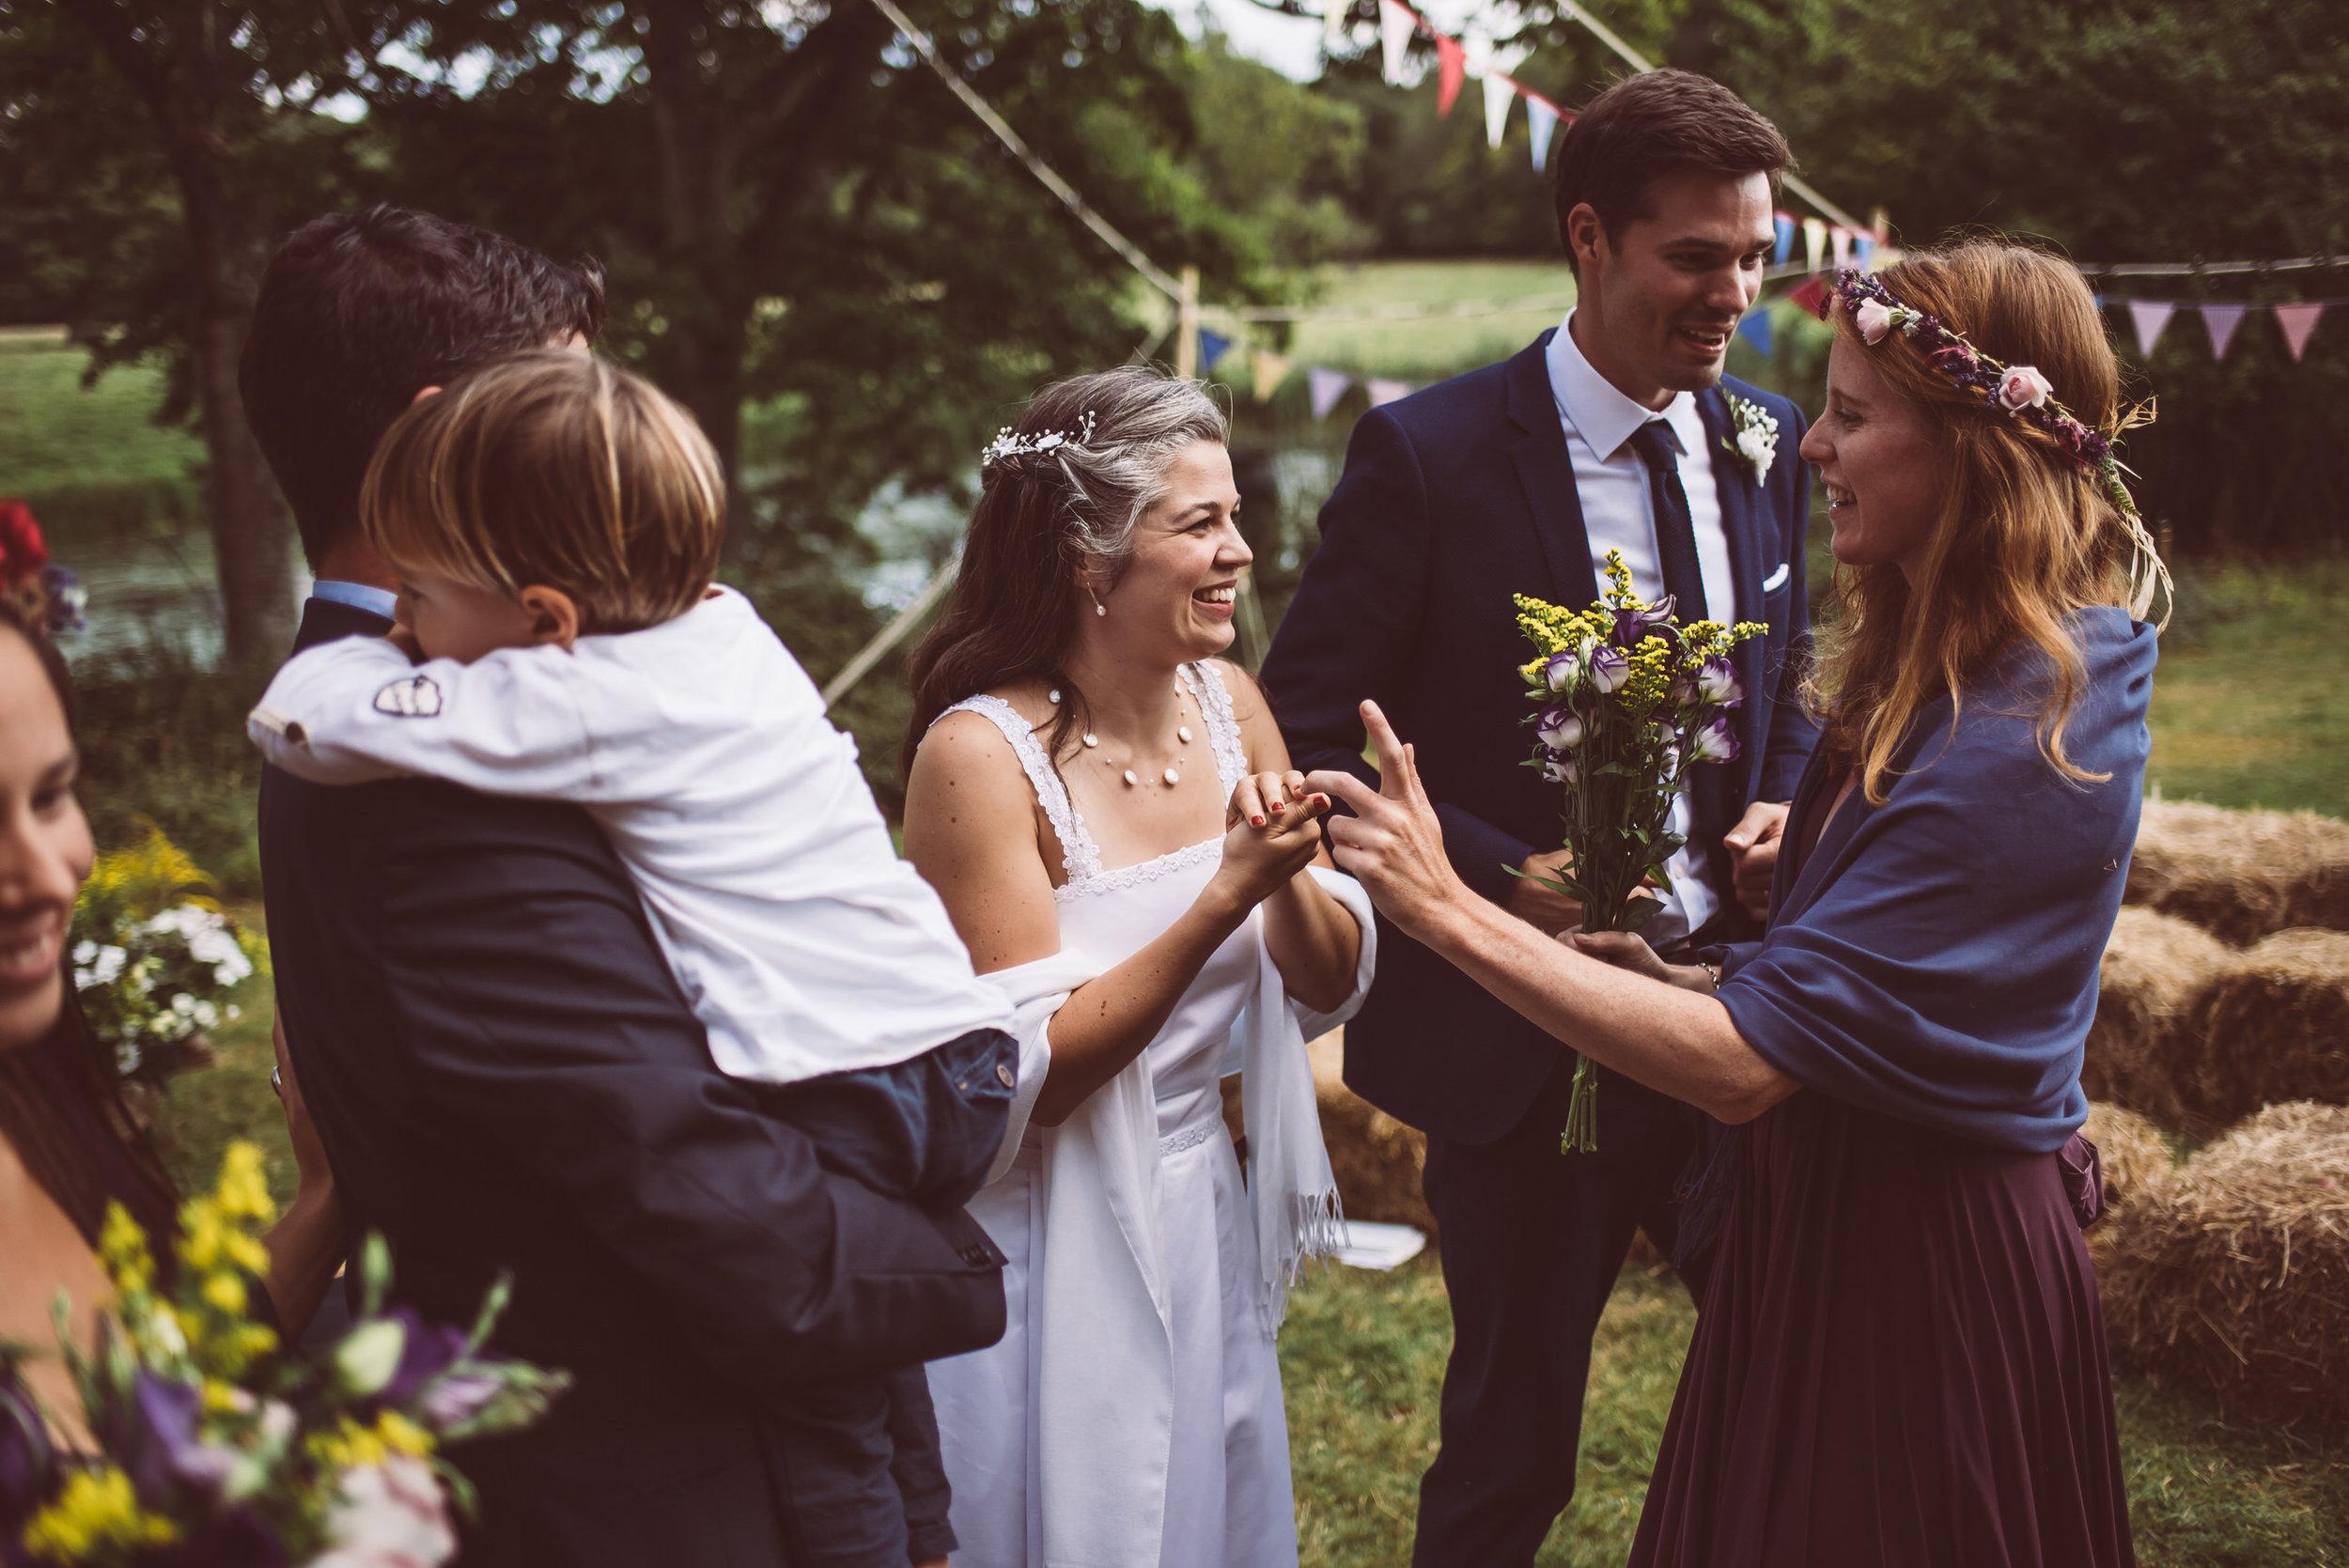 knepp-castle-boho-outdoor-wedding-264.jpg